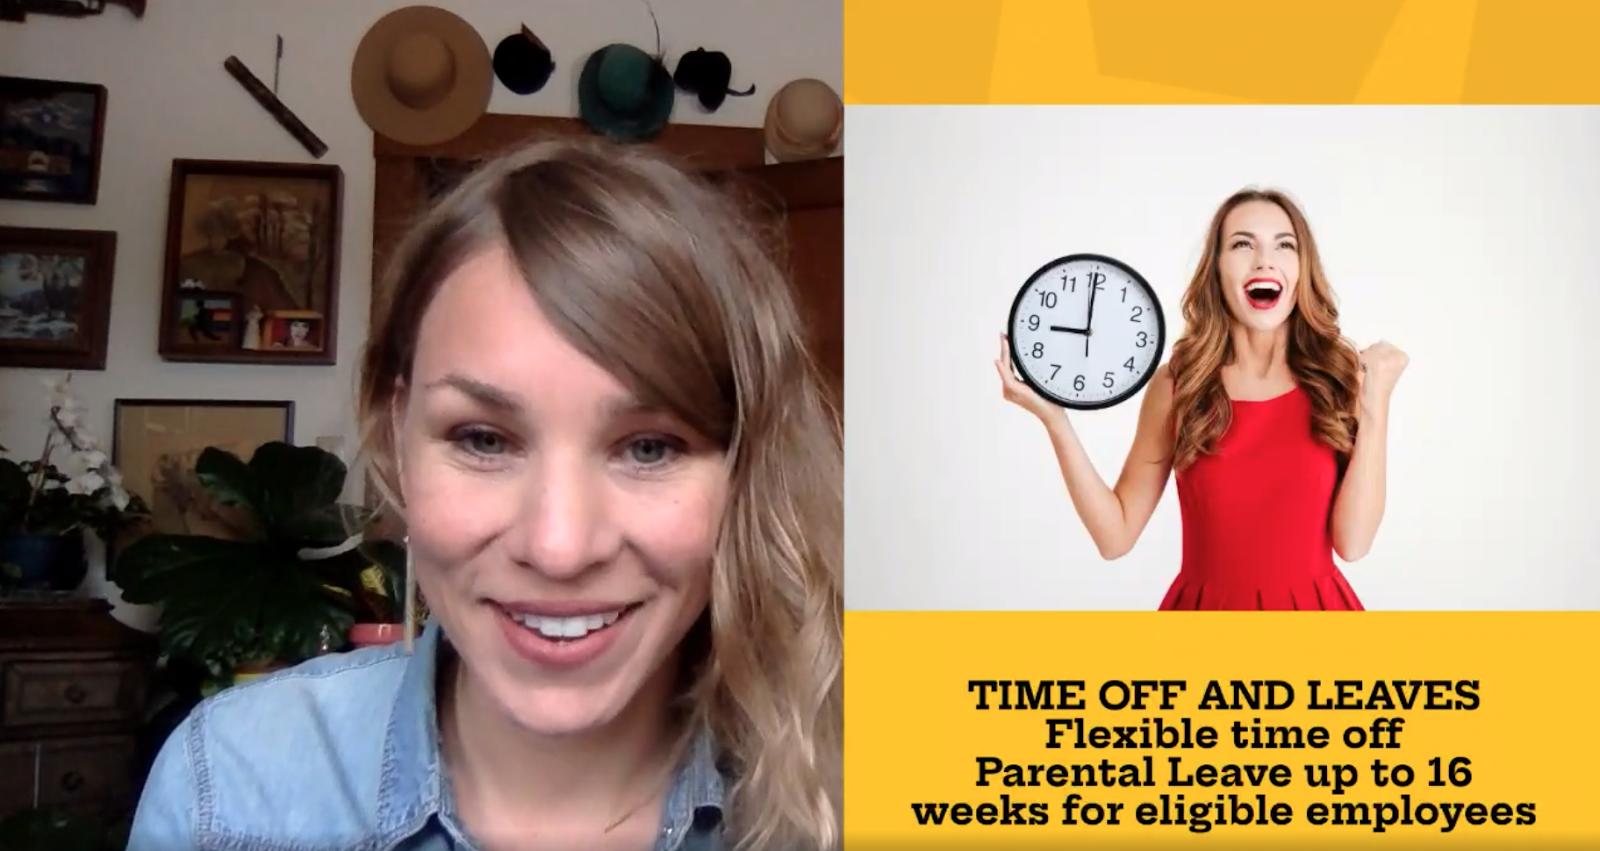 For remote interviews at Prezi, we use Prezi Video to highlight benefits.